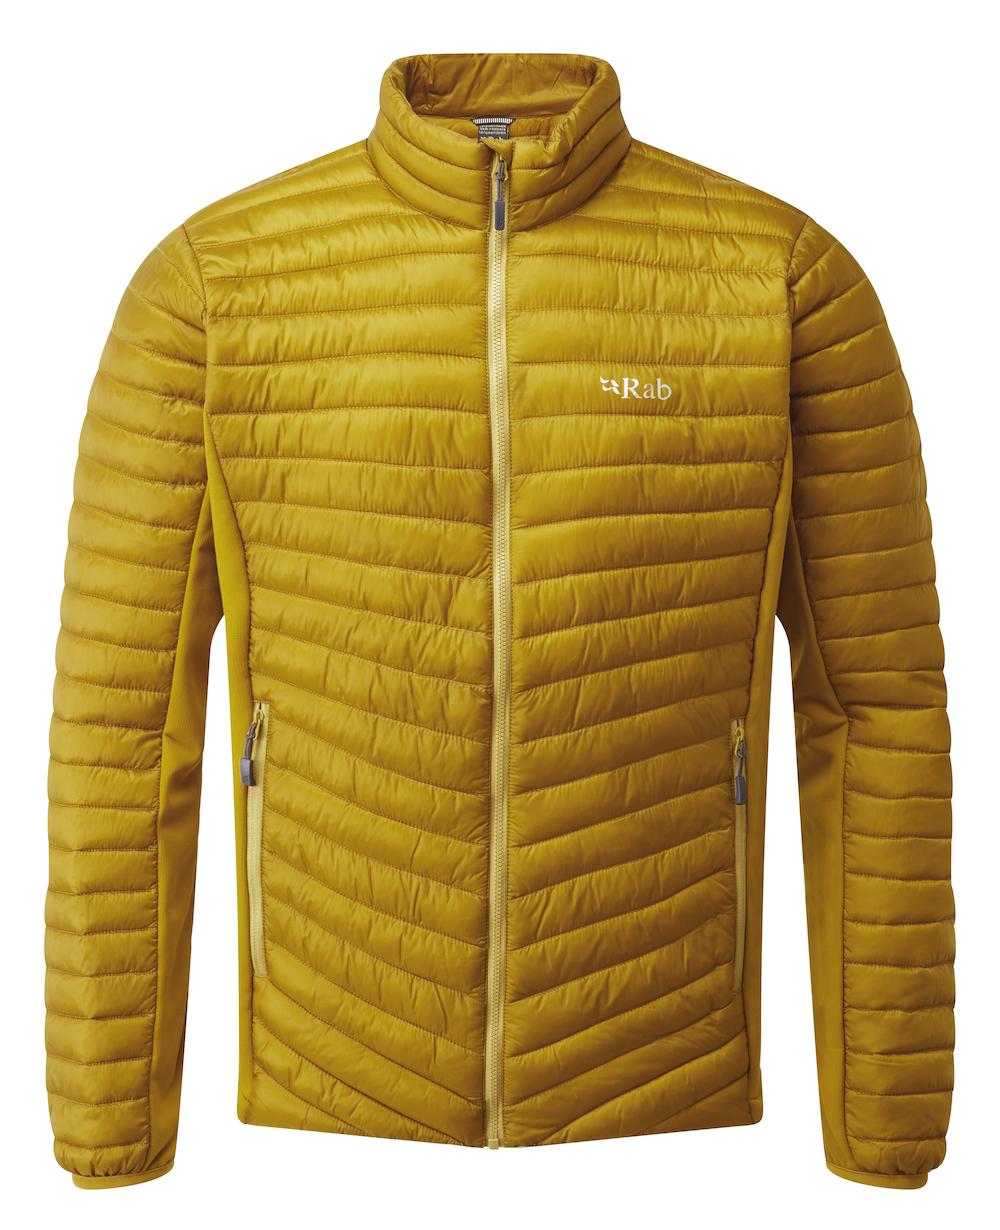 Rab Cirrus Flex Jacket - Insulated jacket - Men's